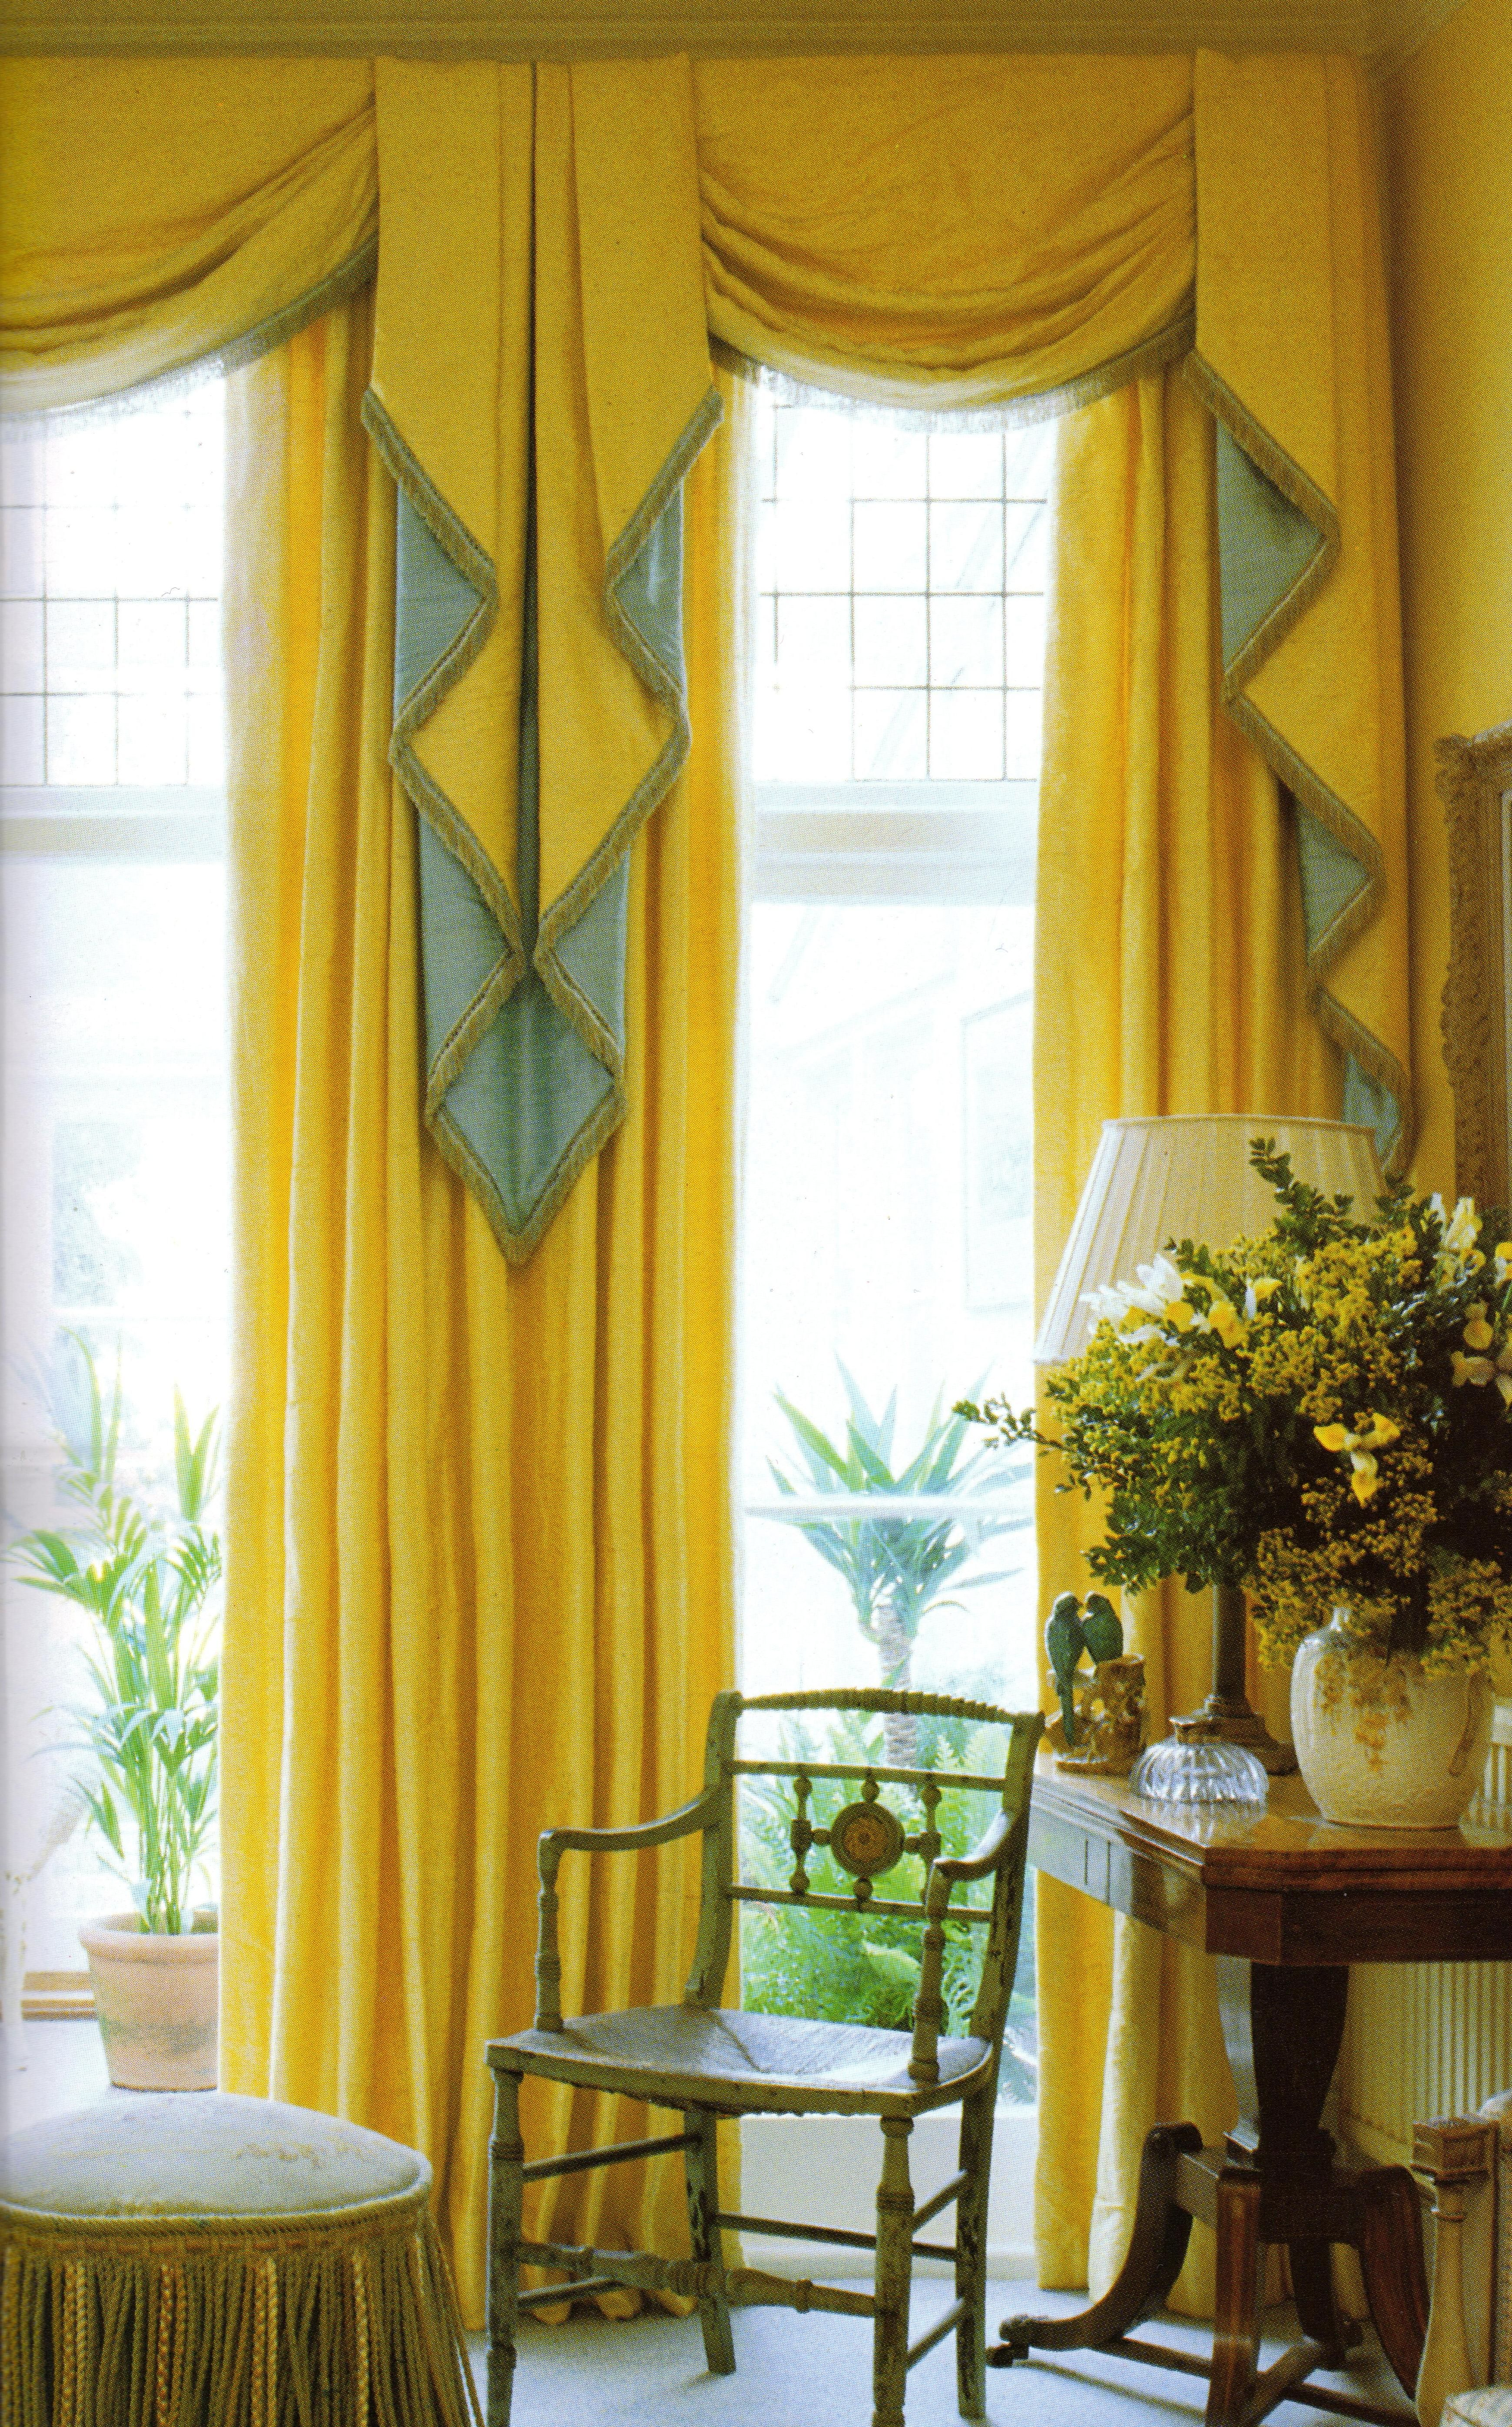 swag drape golden sheer blockout valance eyelet curtain curtains majesty gold pelmets coast blackout yellow index pelmet